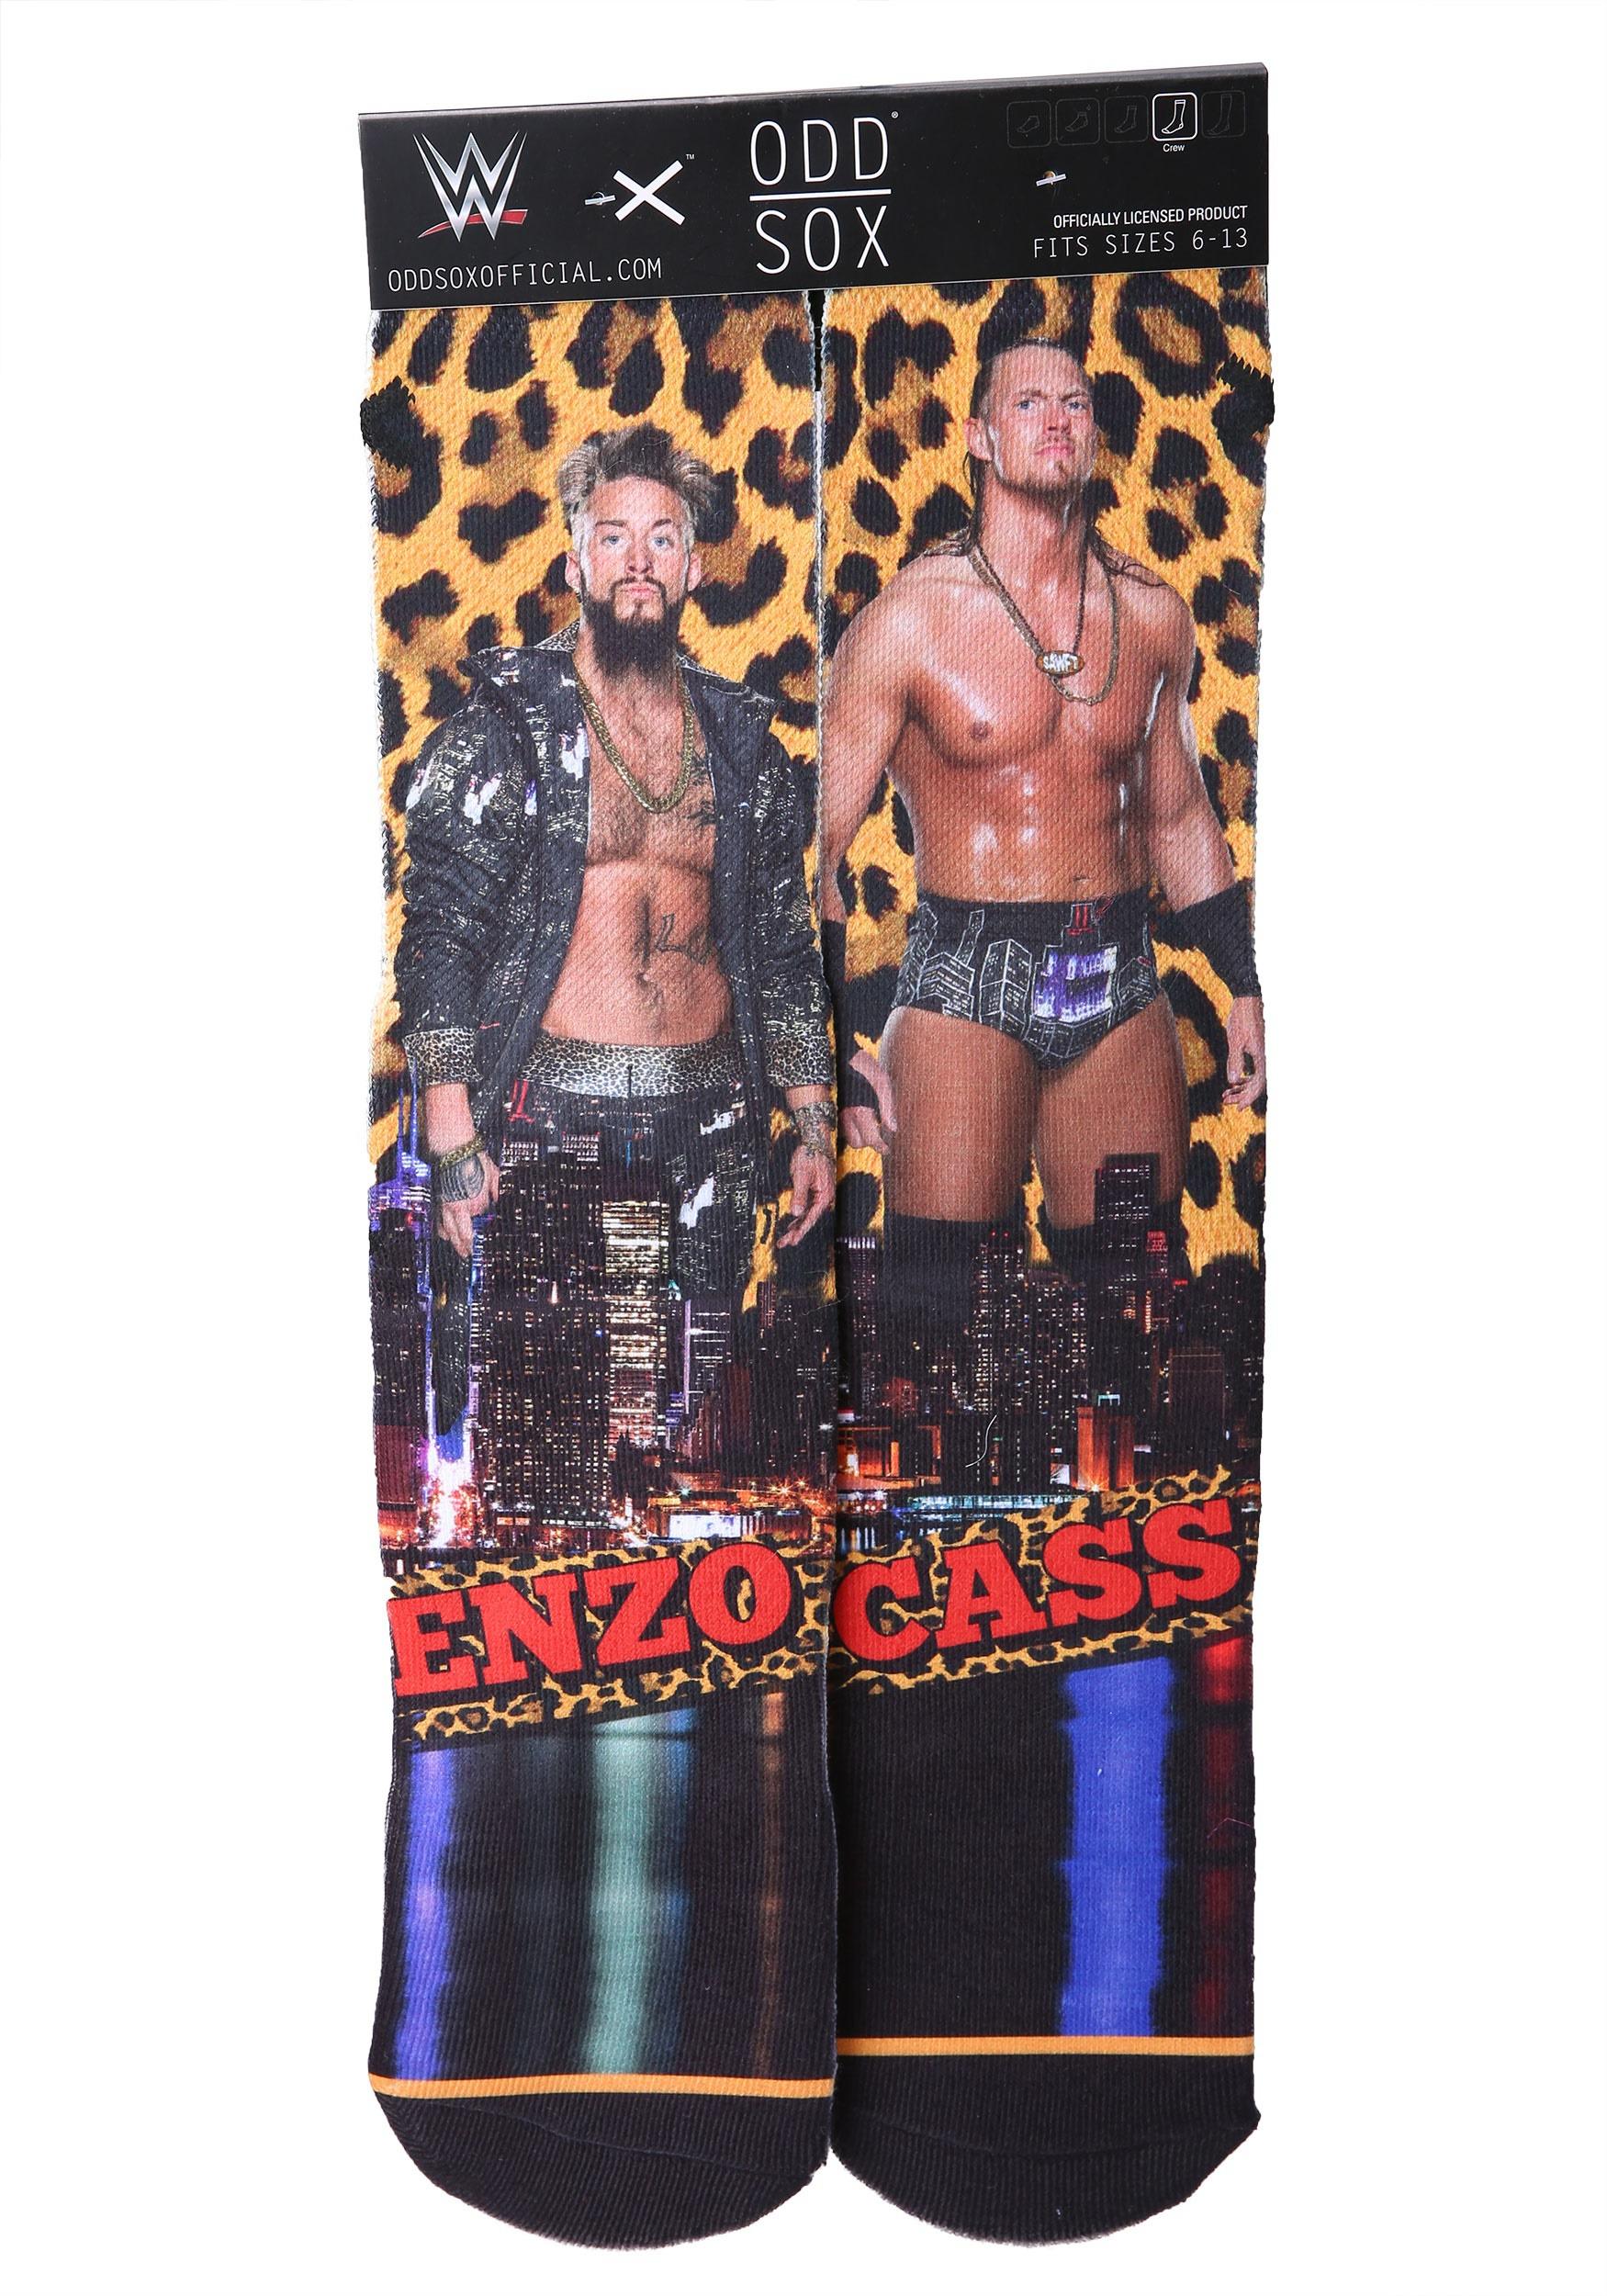 Adults WWE Enzo & Cass Odd Sox